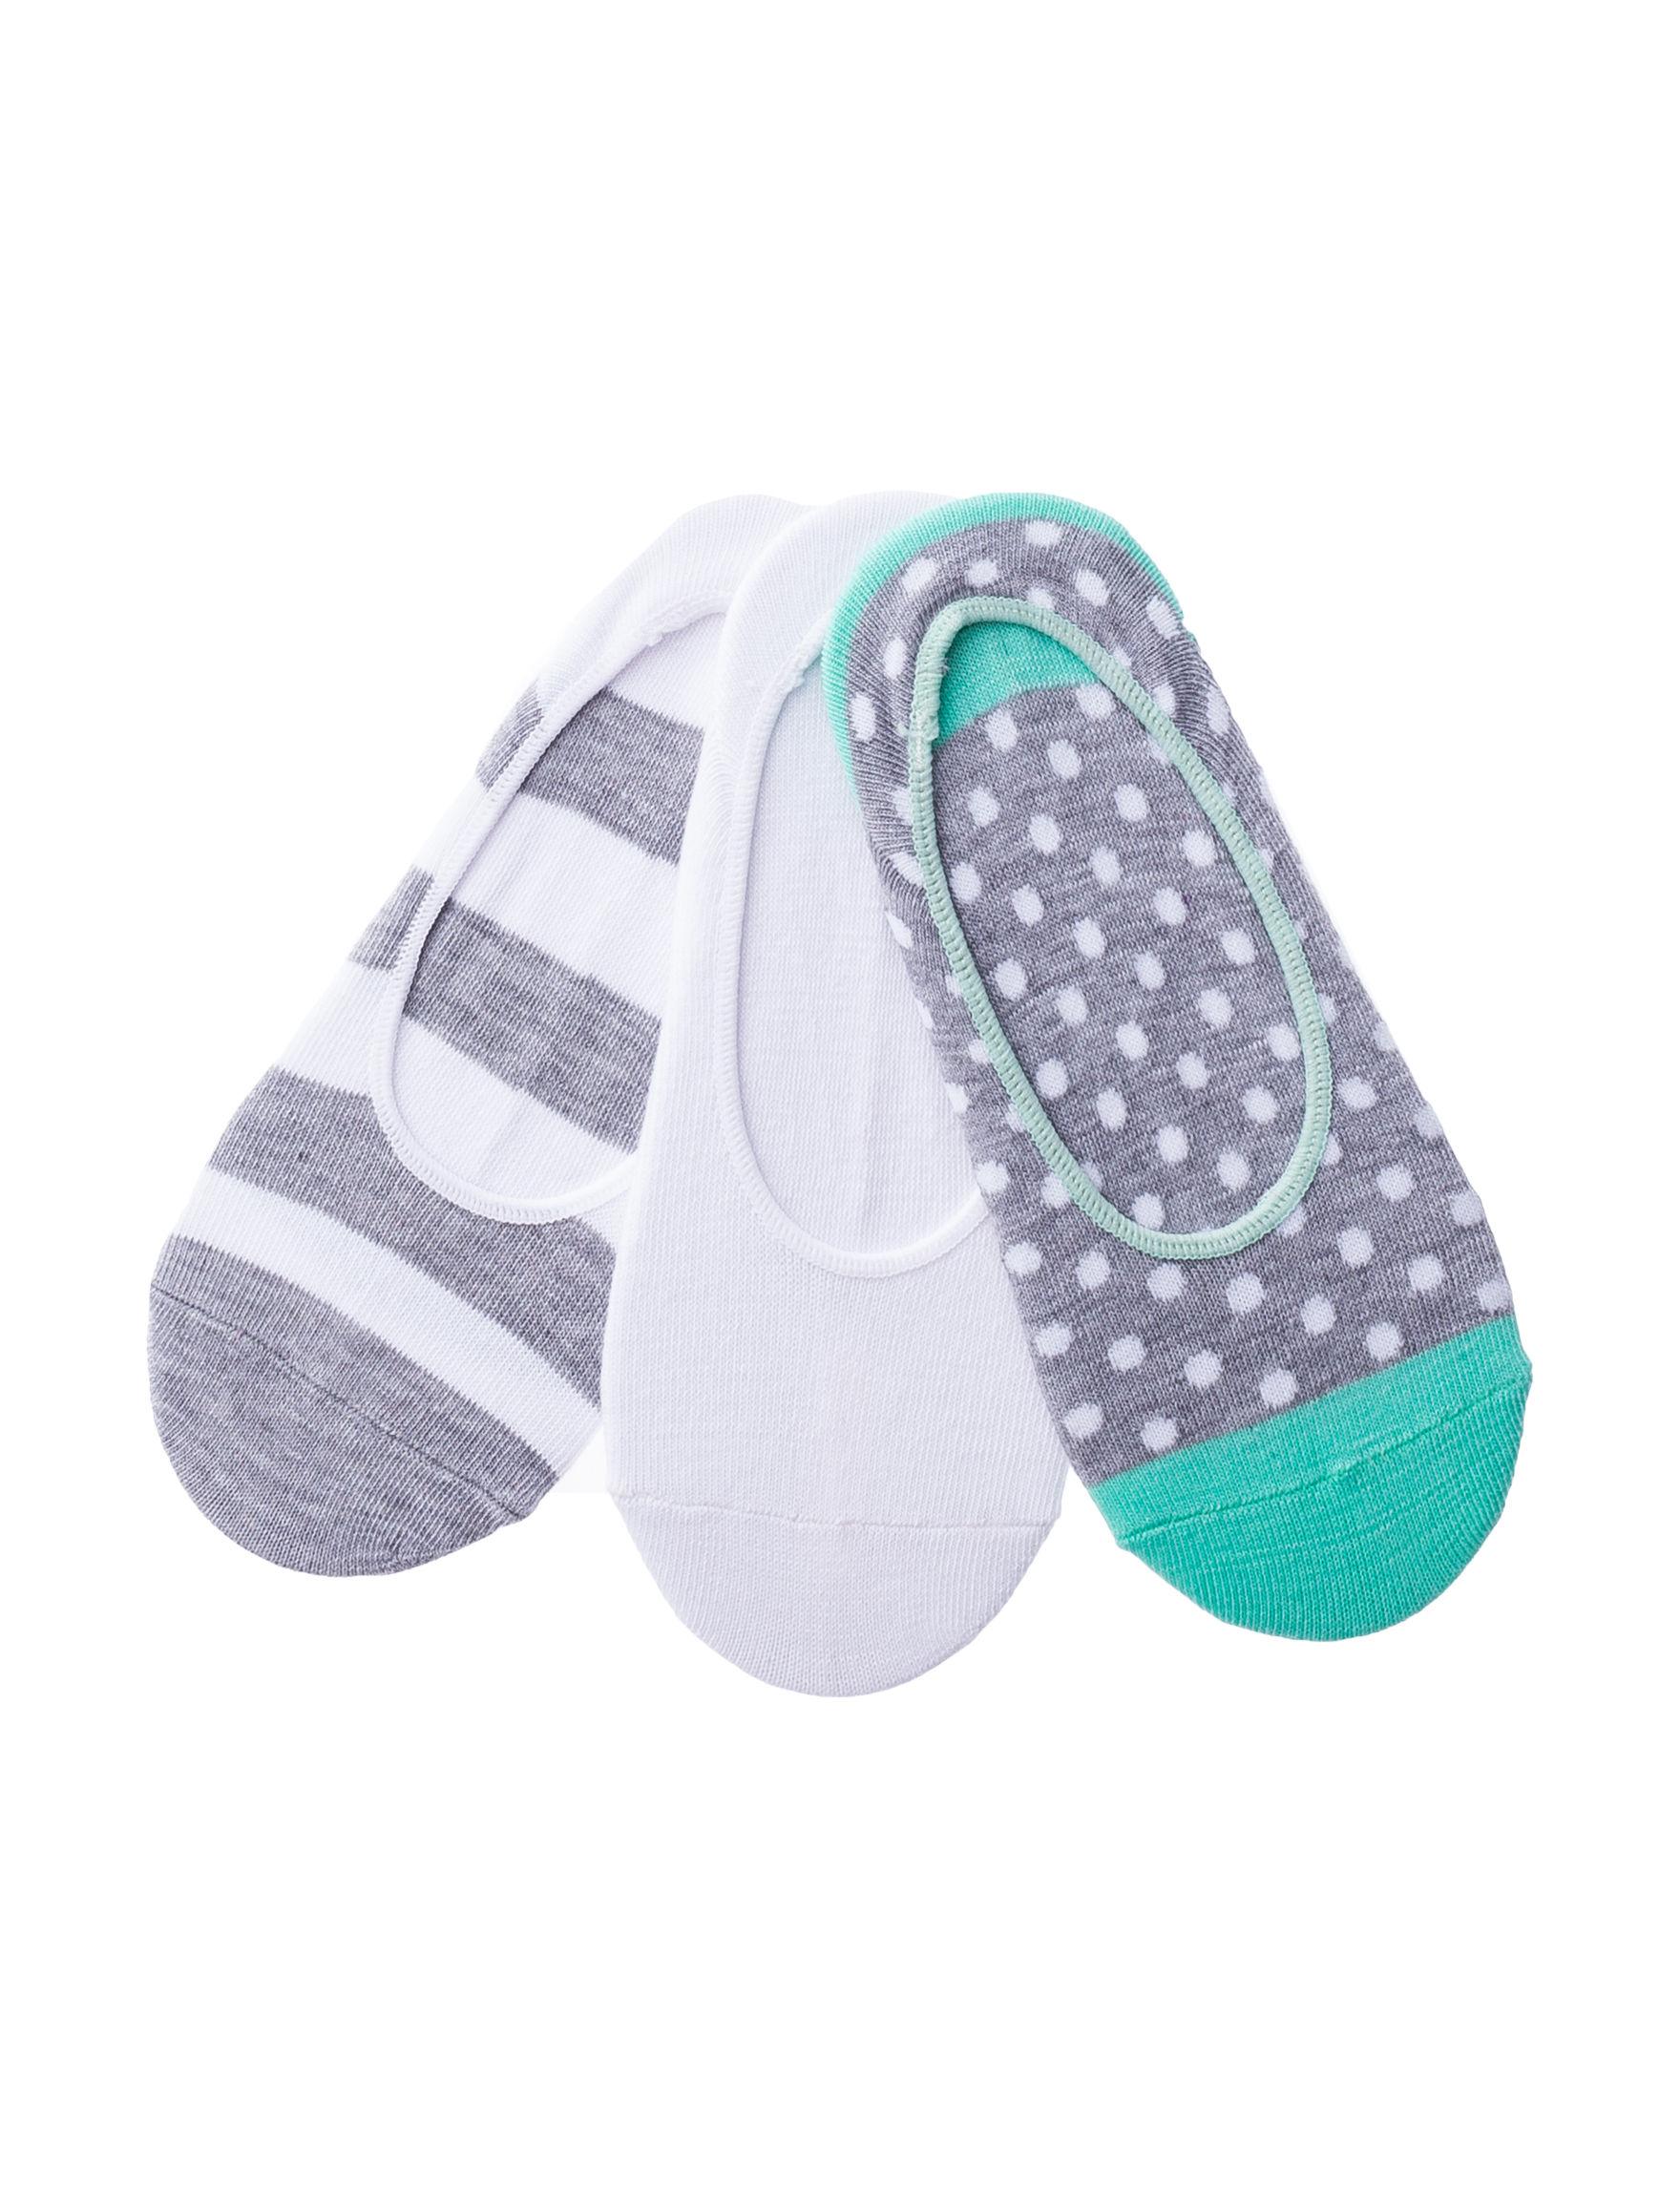 Sox & Co Grey / Green Socks